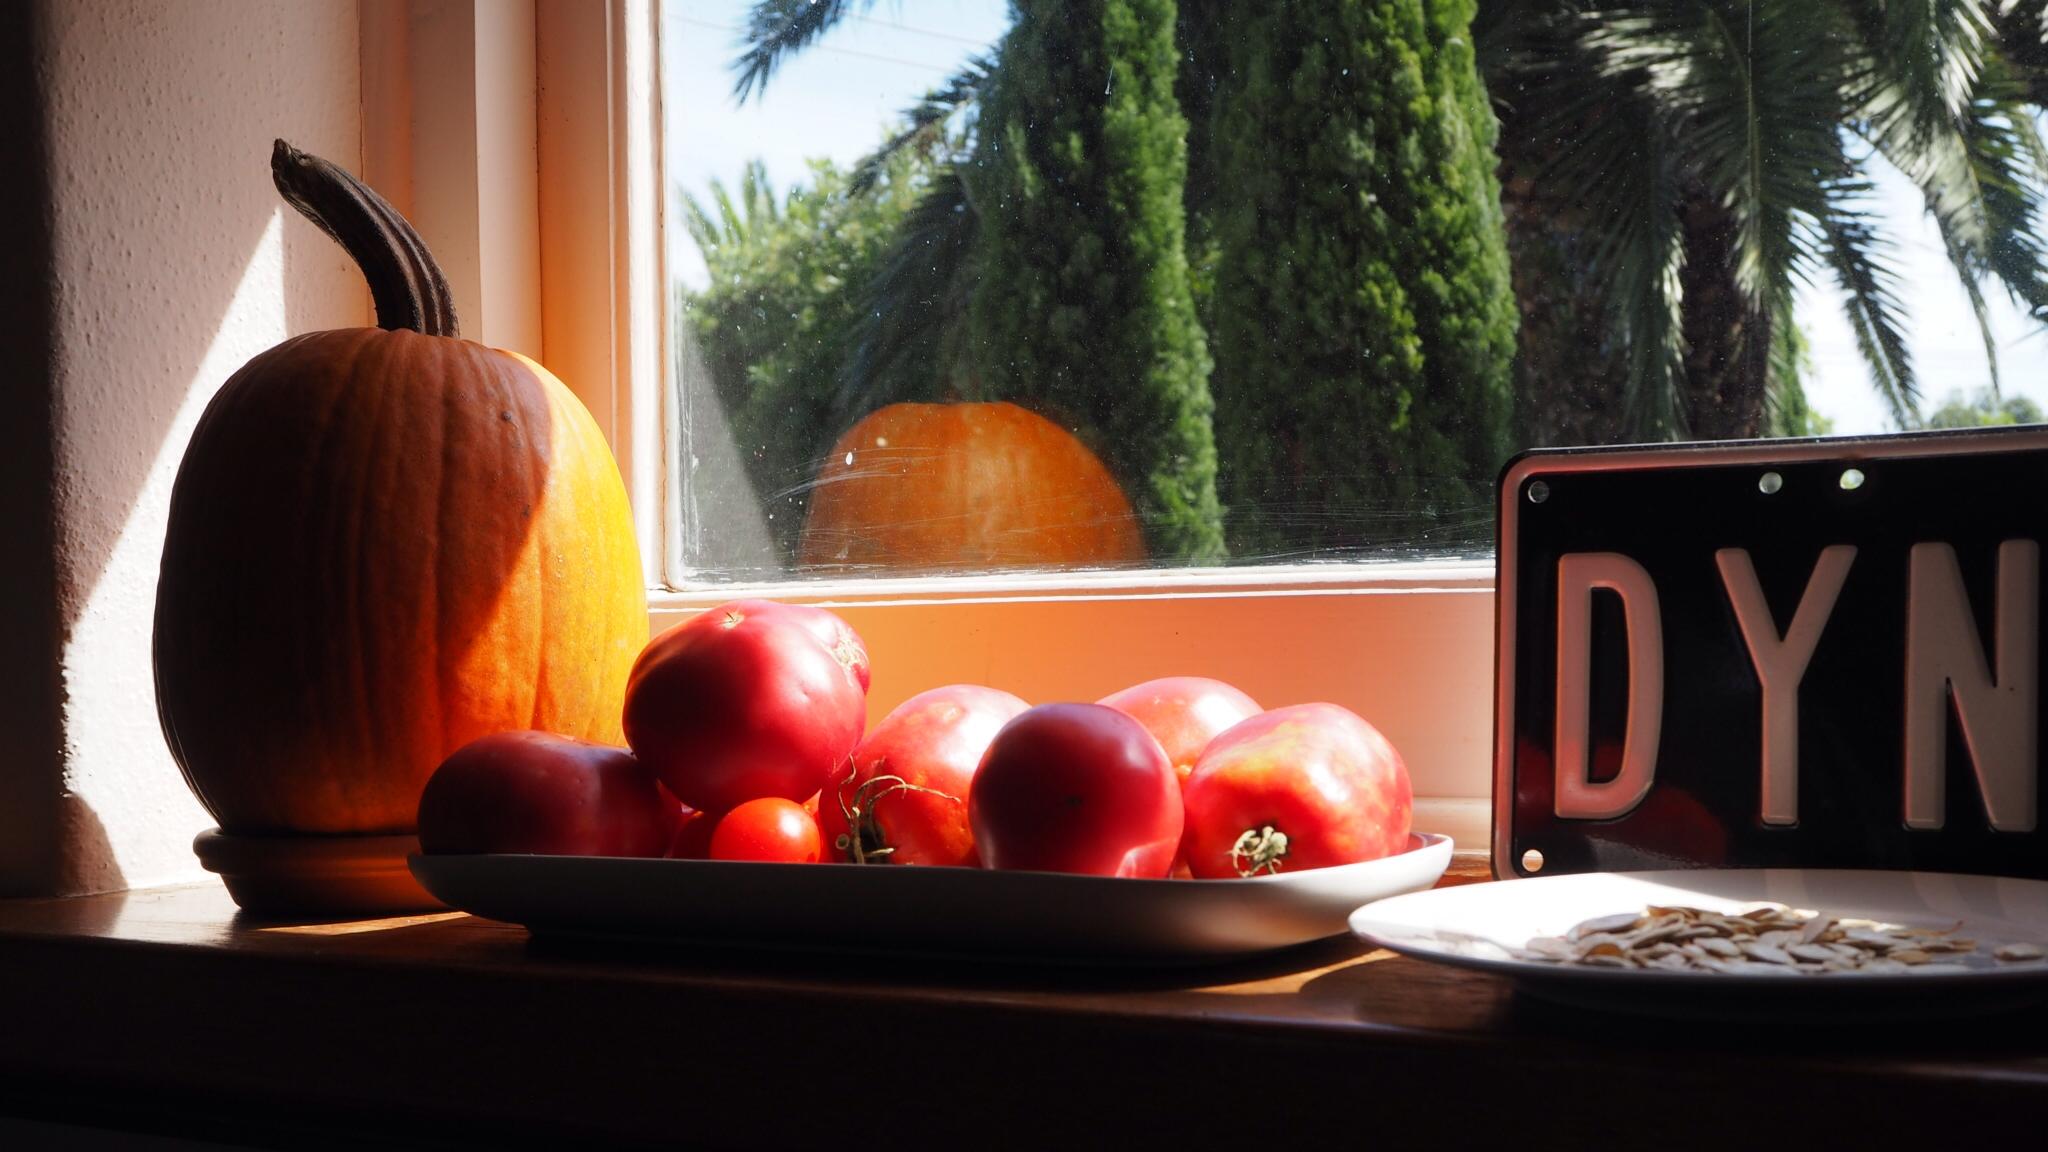 Tomatoes ripen on window sill in the sun